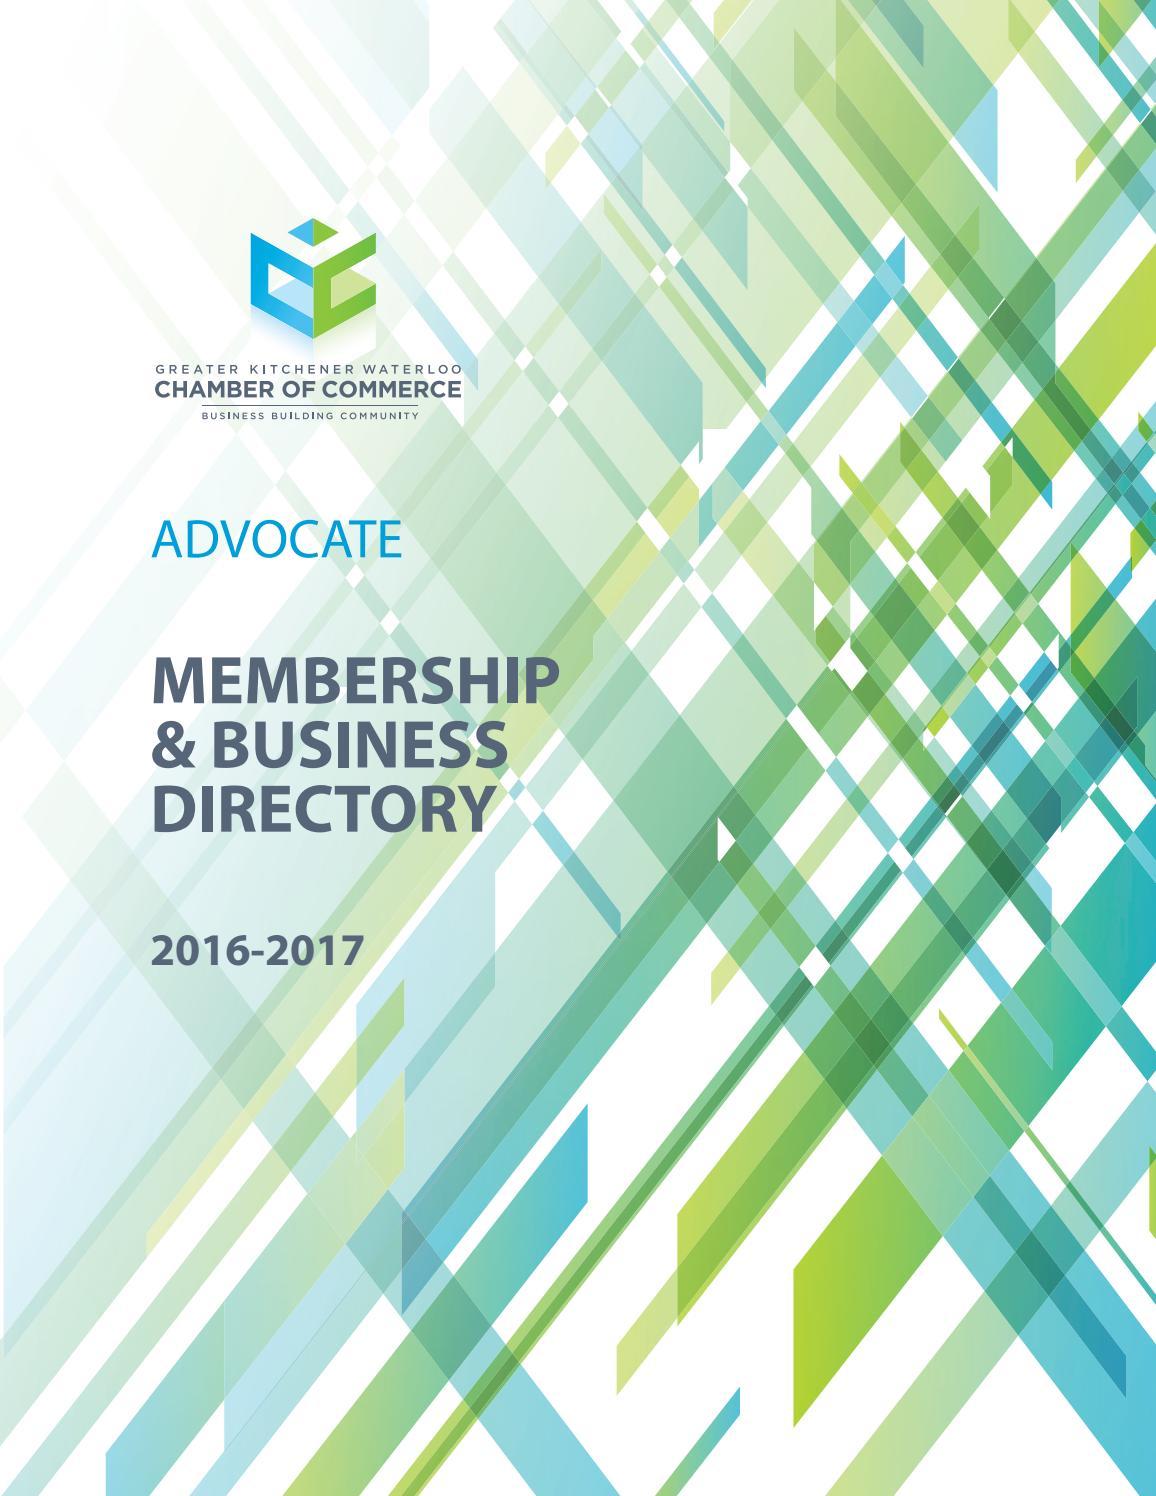 2016-2017 Membership & Business Directory by Natalie Hemmerich - issuu